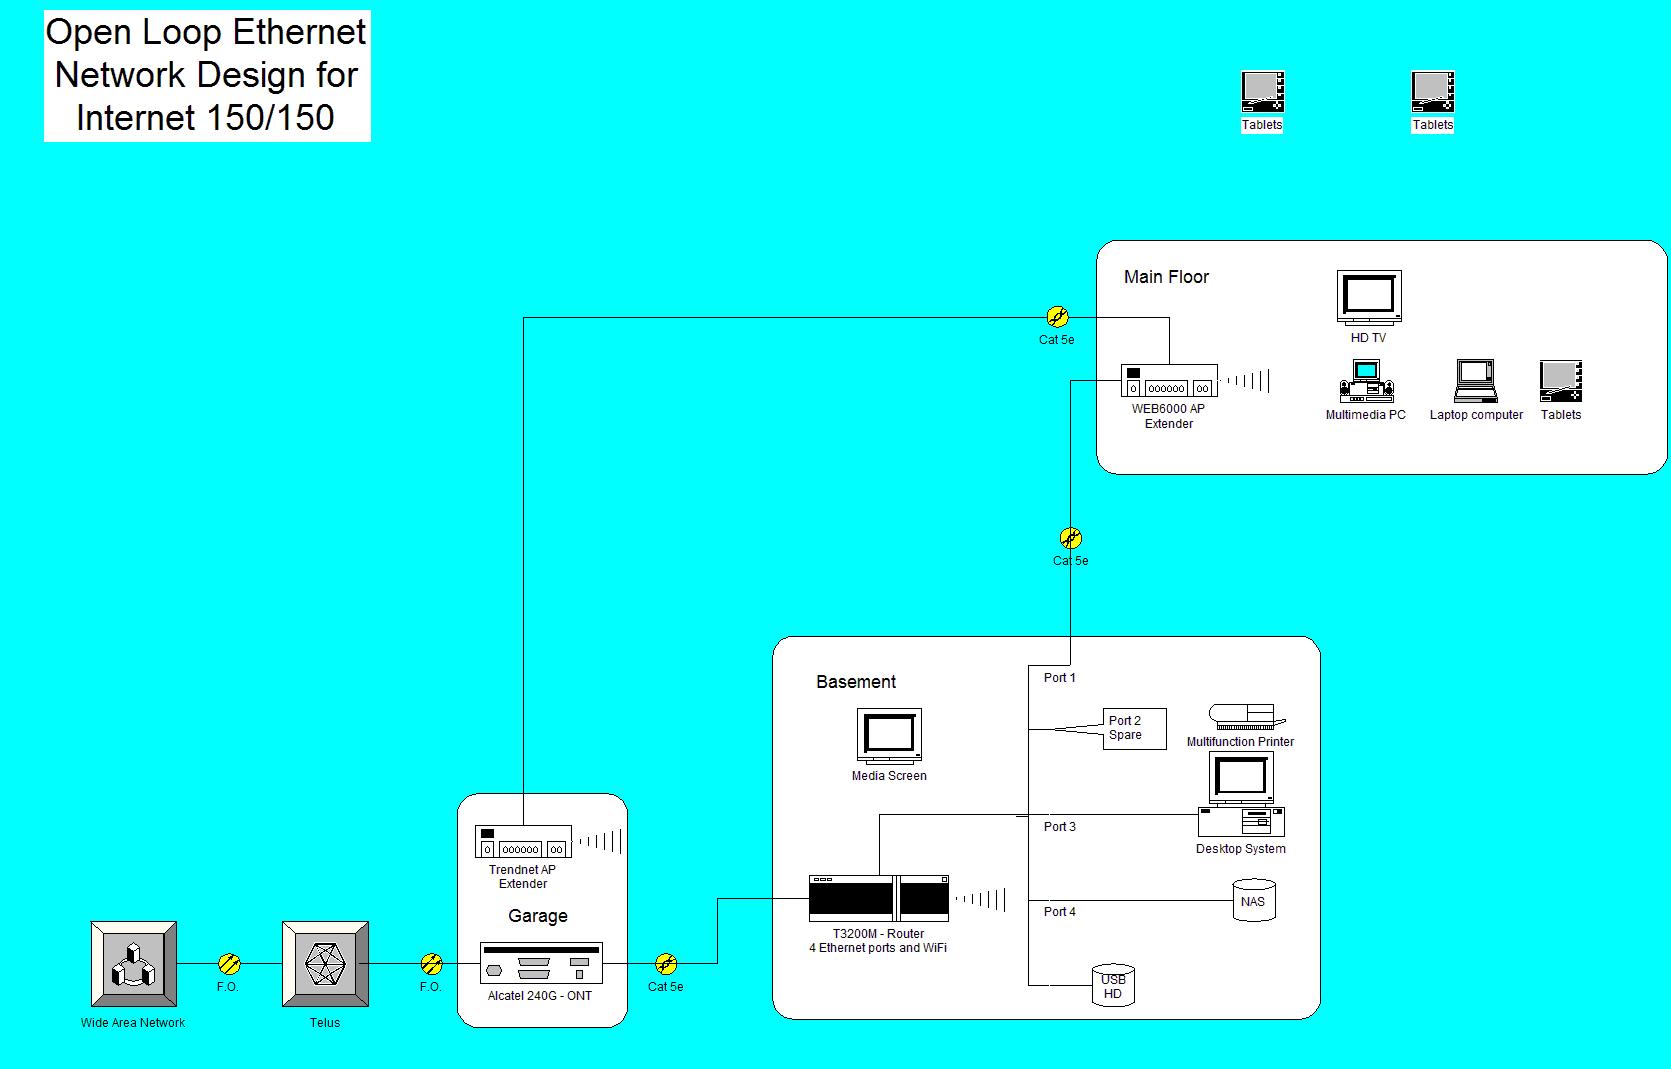 split cat5 diagram best wiring library Cat5 Wall Outlet my fibre internet 150 150 install photos and diagram telus neighbourhood